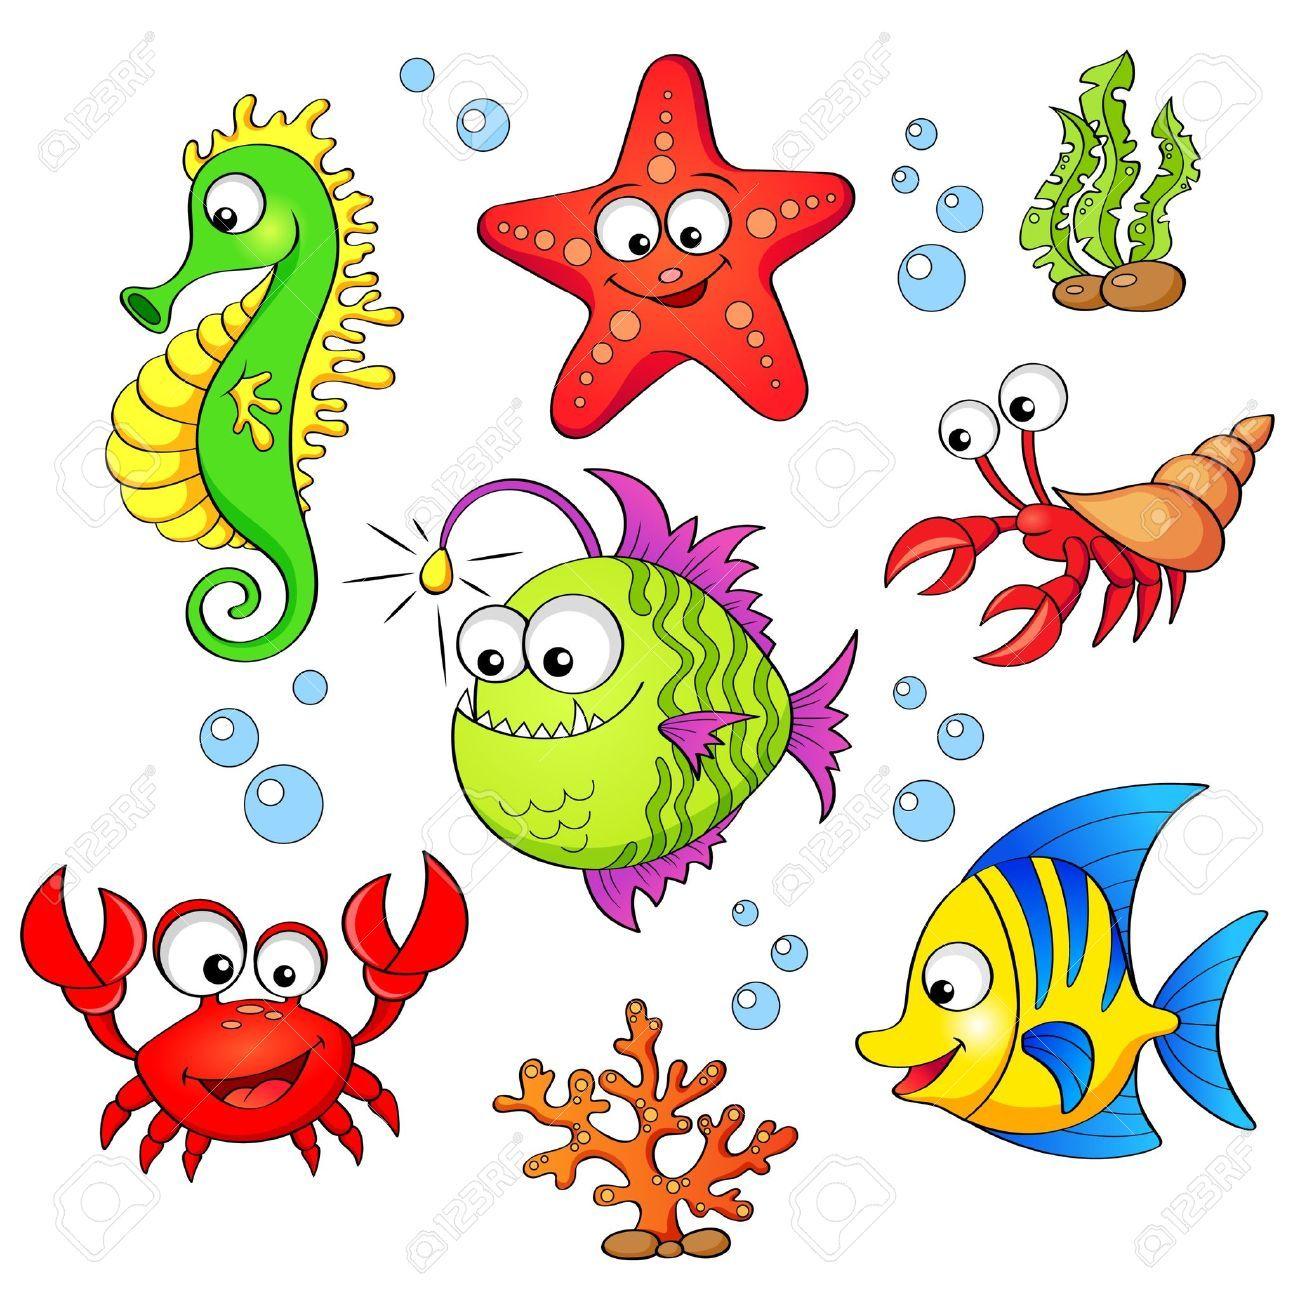 Image Result For Sea Life Illustration Cartoon Sea Animals Sea Animals Cartoon Fish